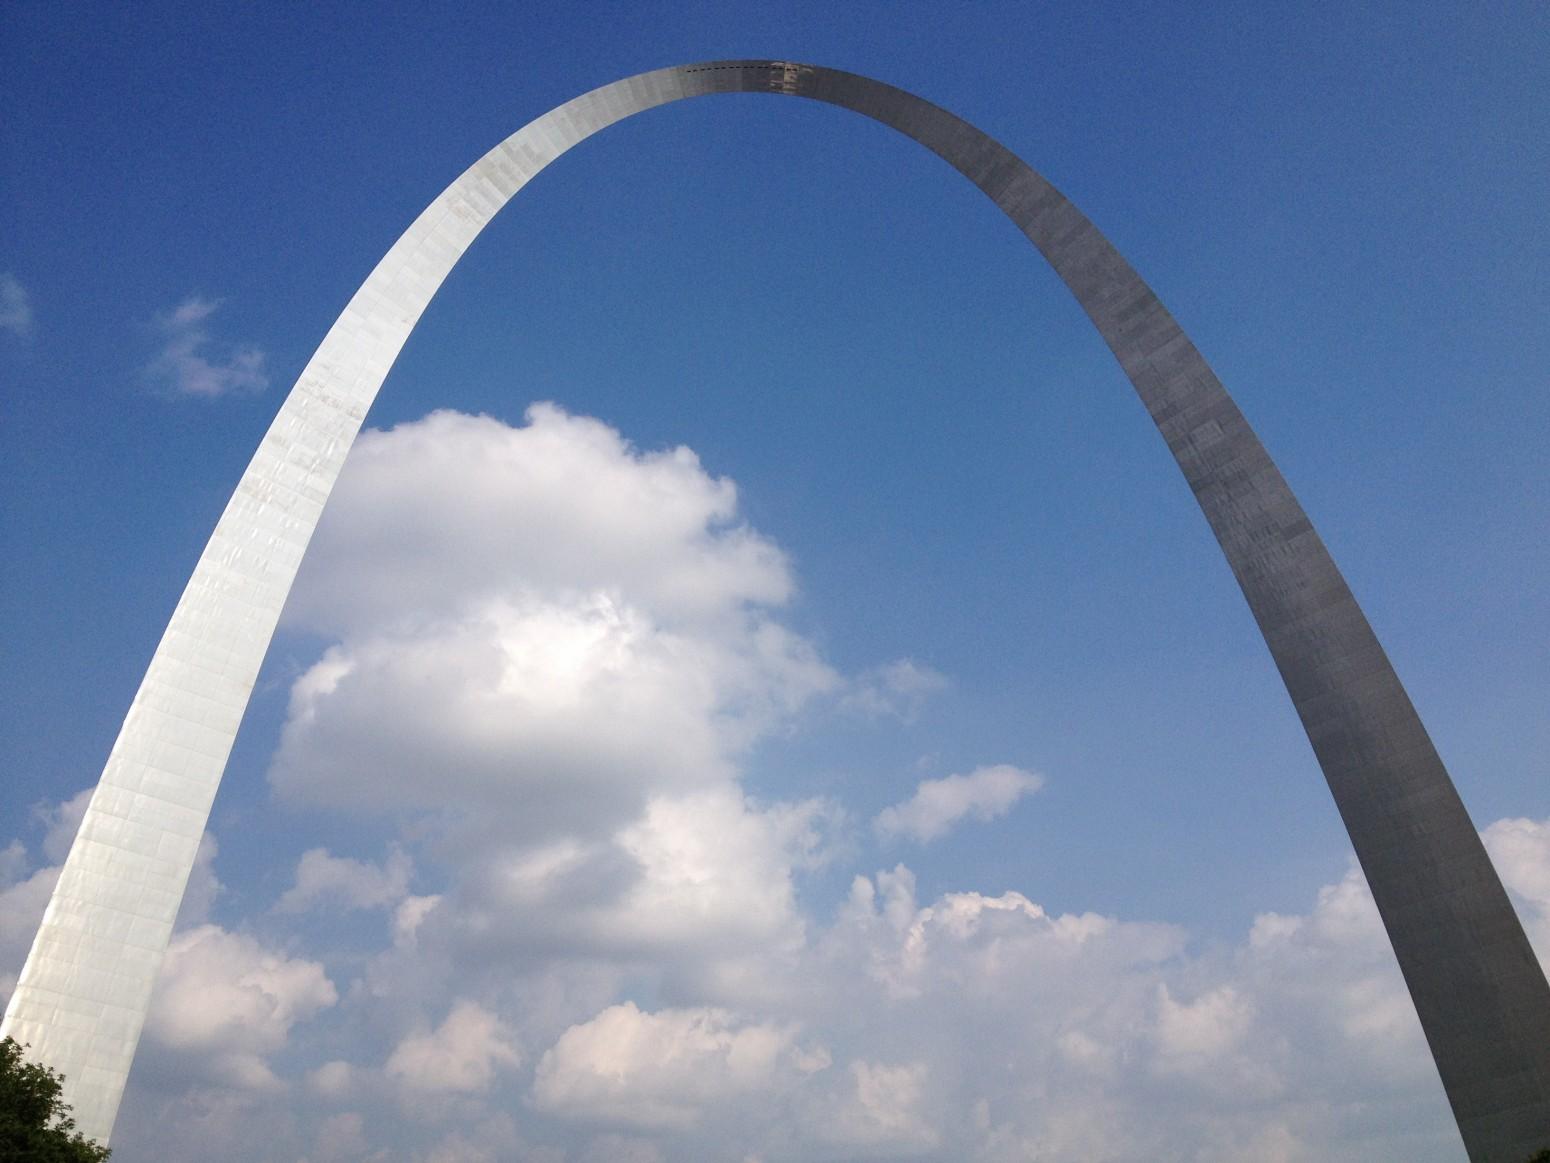 St.-Louis-Gateway-to-the-West-e1408726164451.jpg